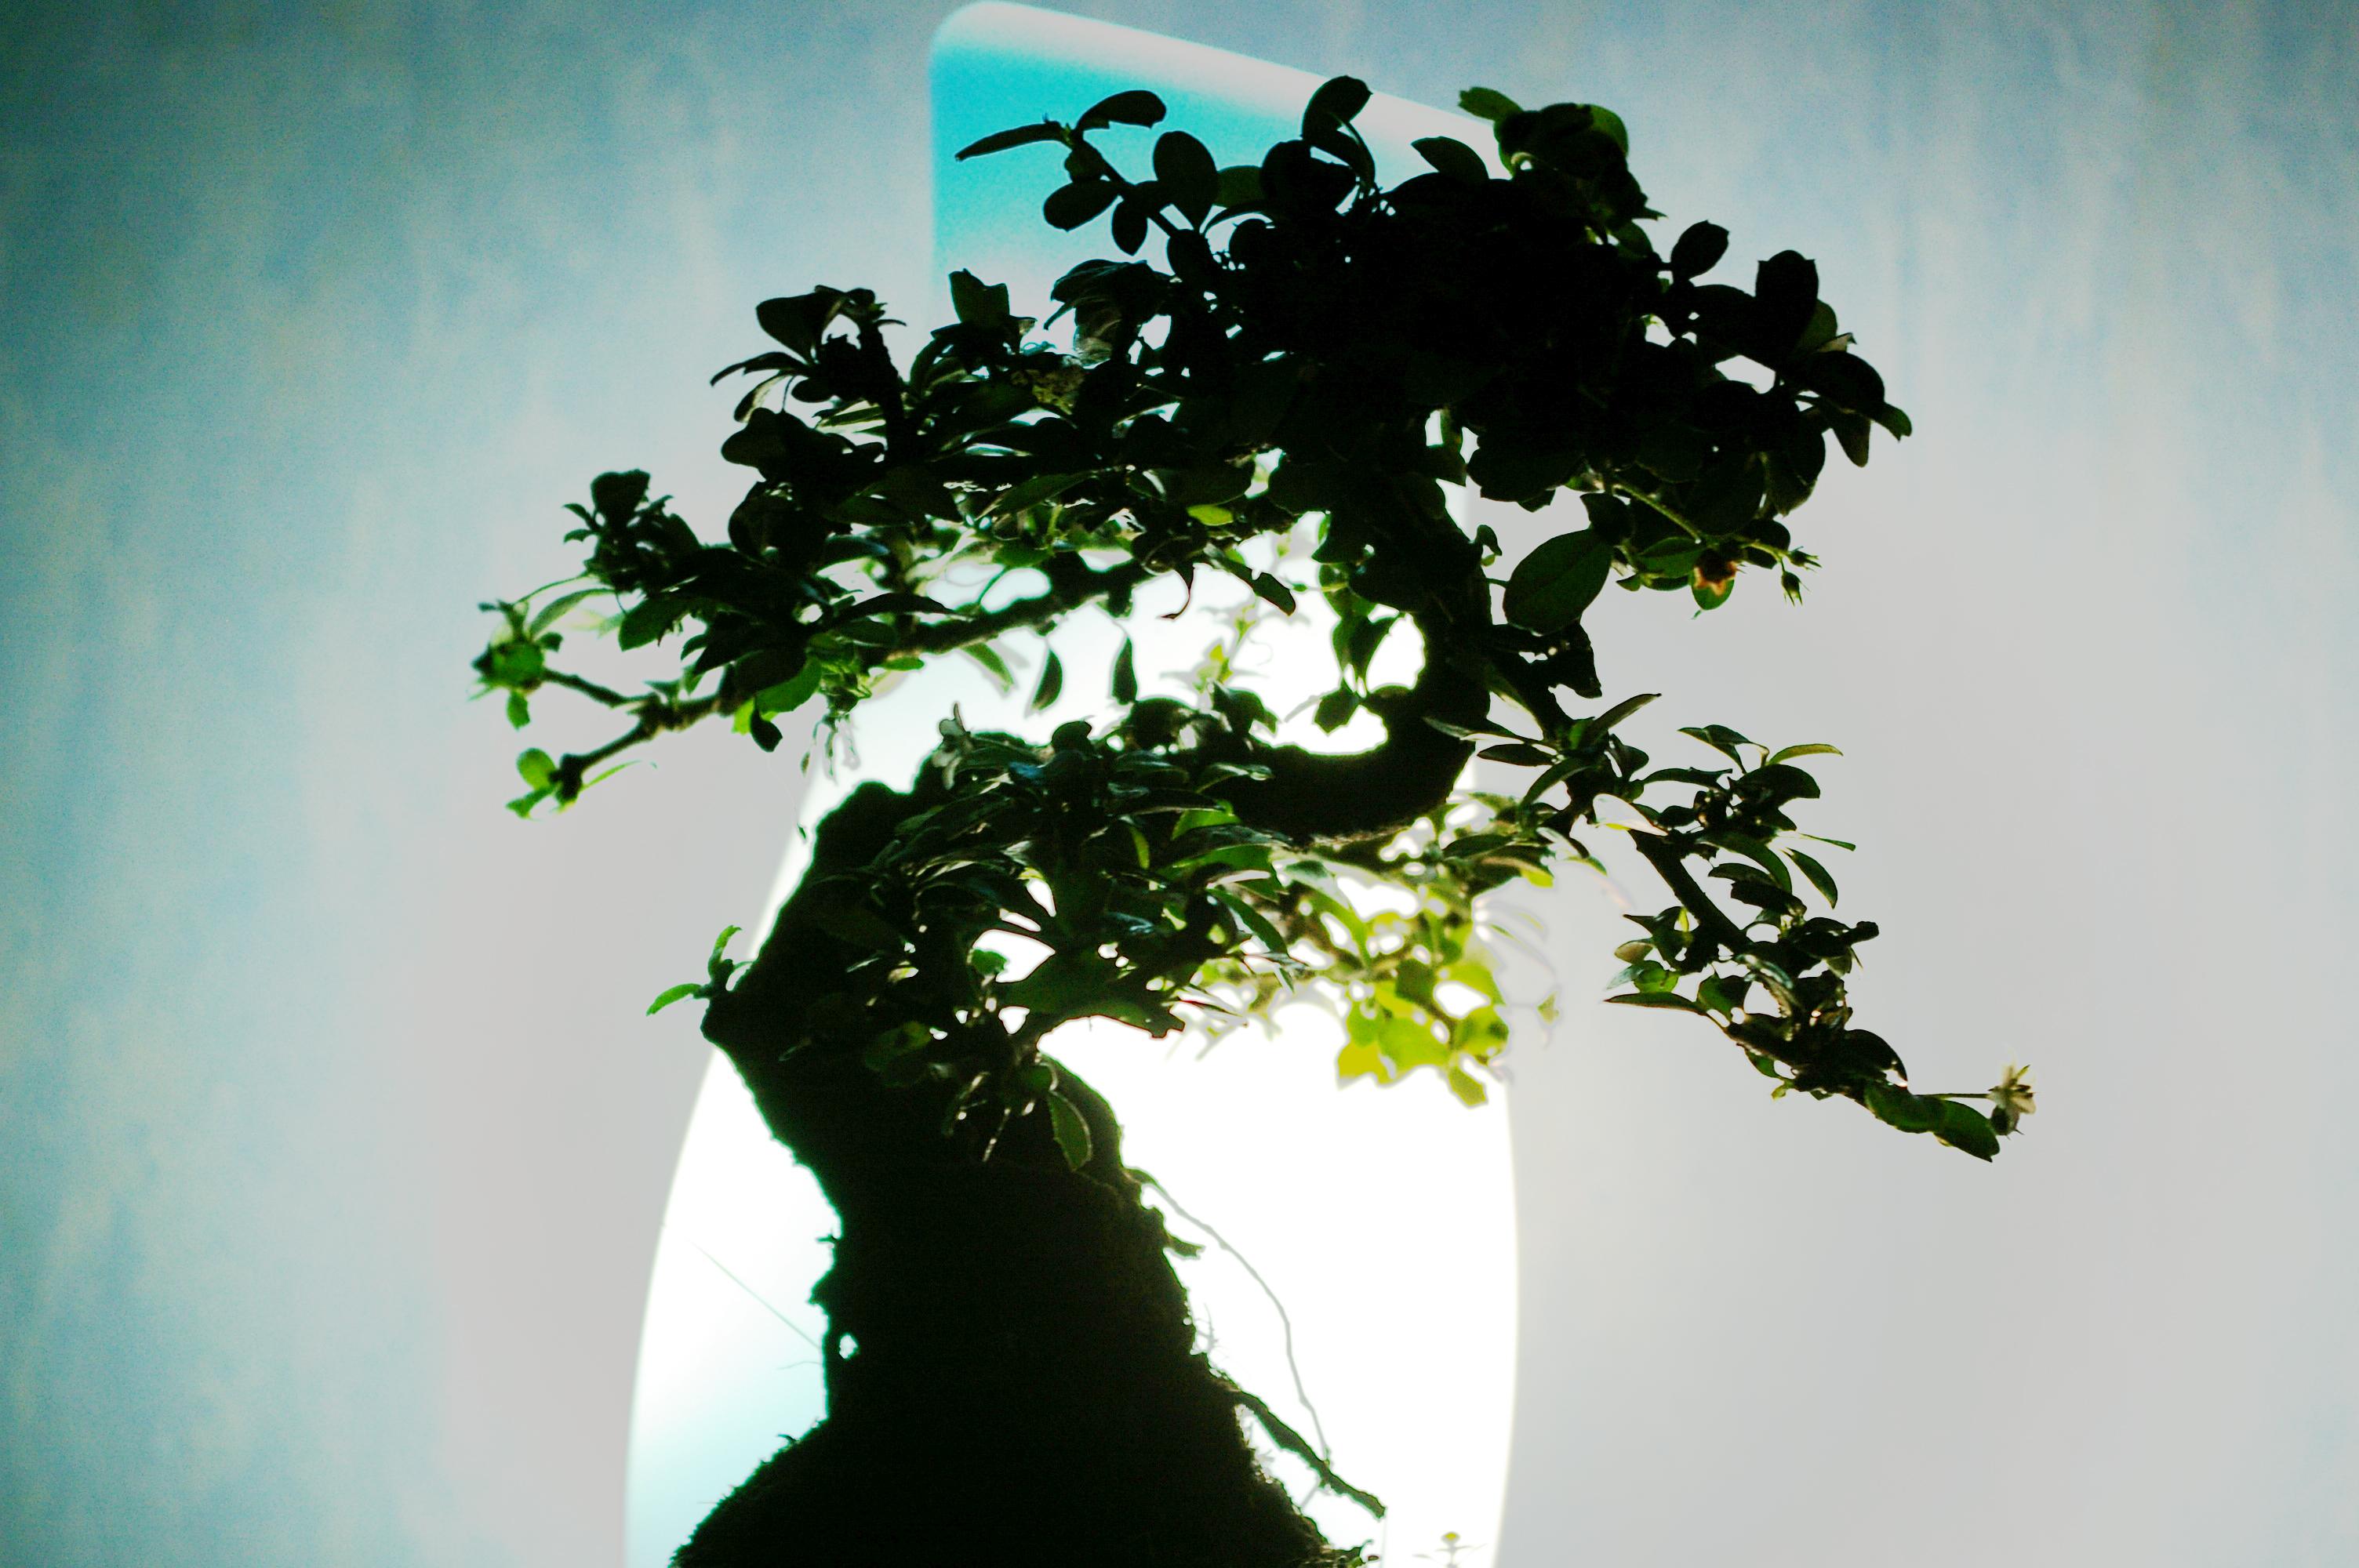 Banzai tree, Bansai, Banzai, Chamber, Green, HQ Photo